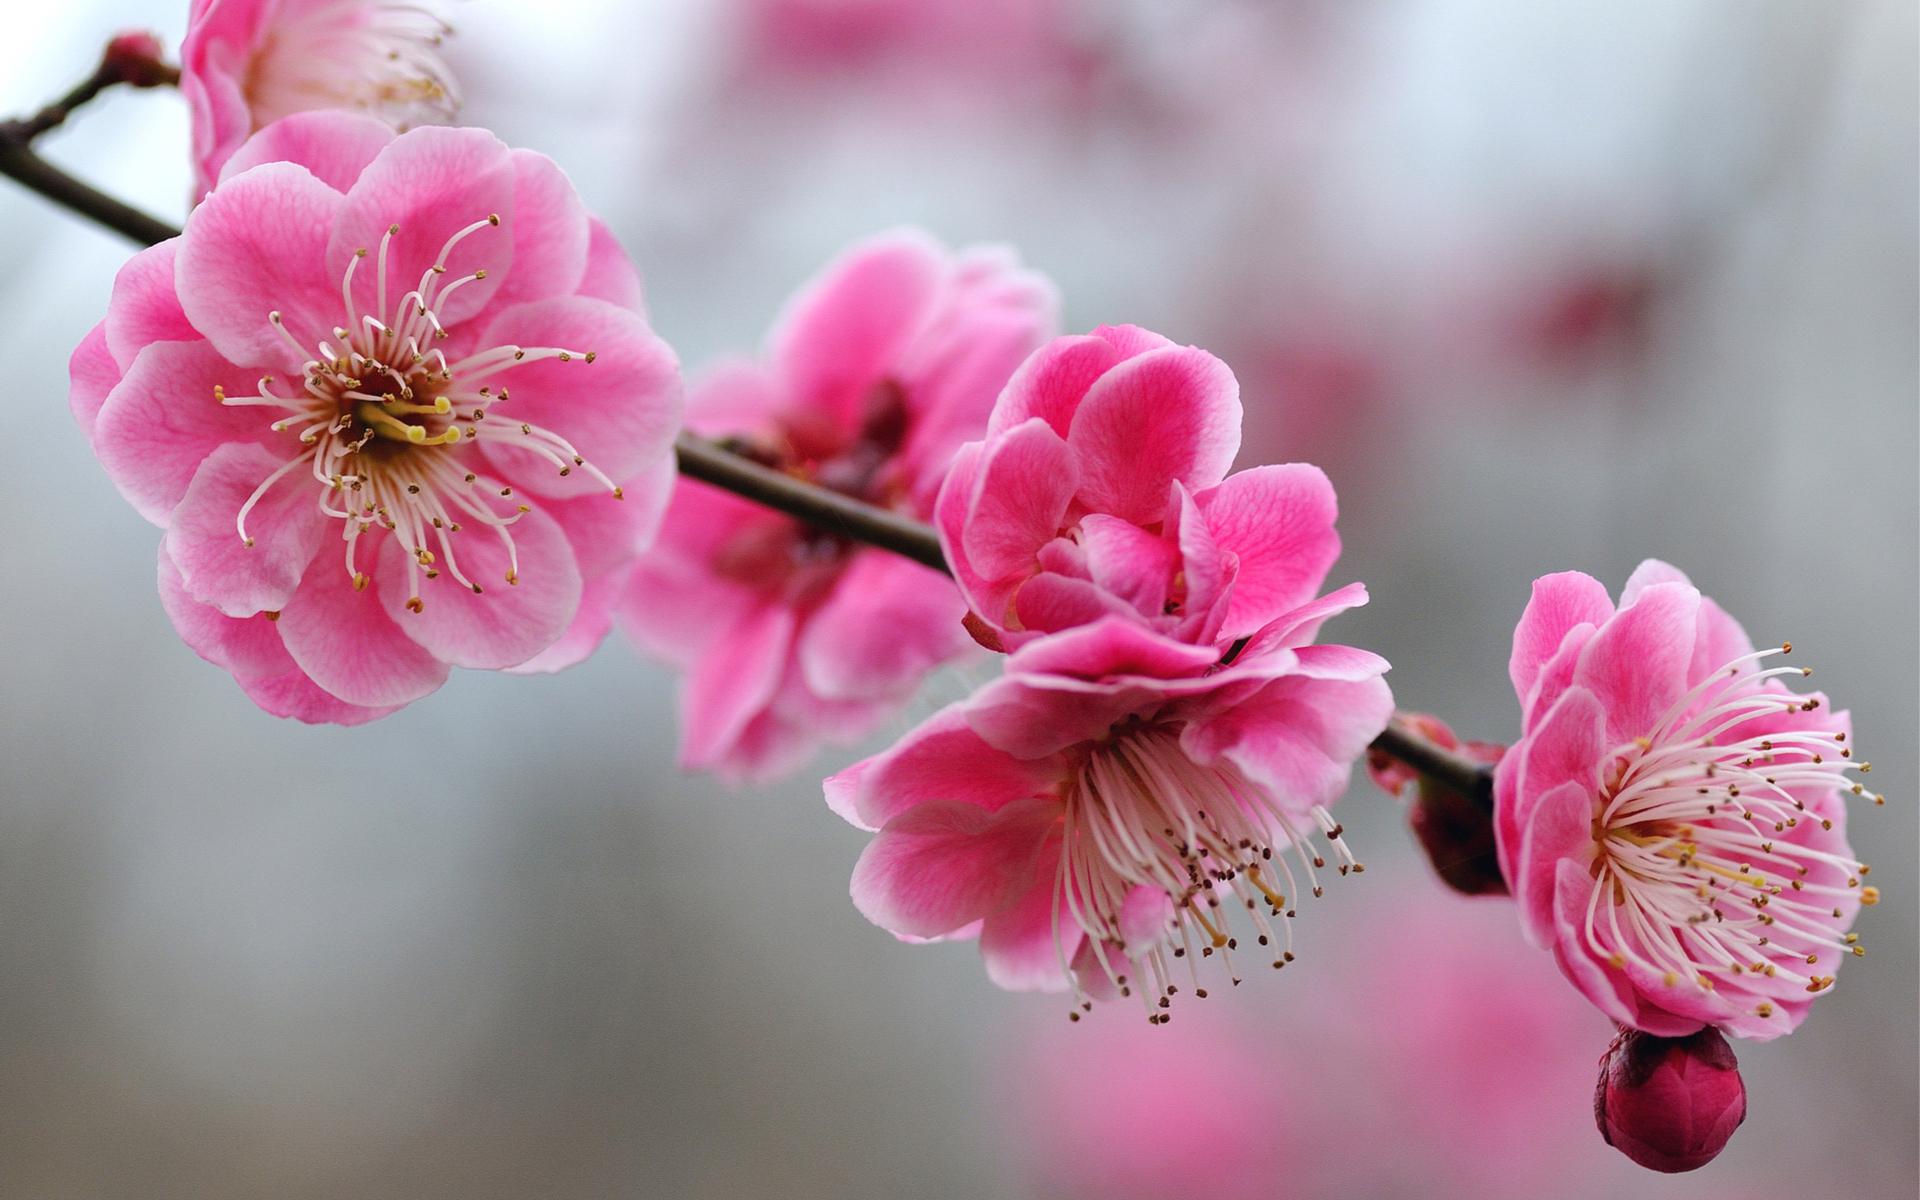 cherry blossoms wallpaper blossom wallpapers walls 1920x1200 1920x1200